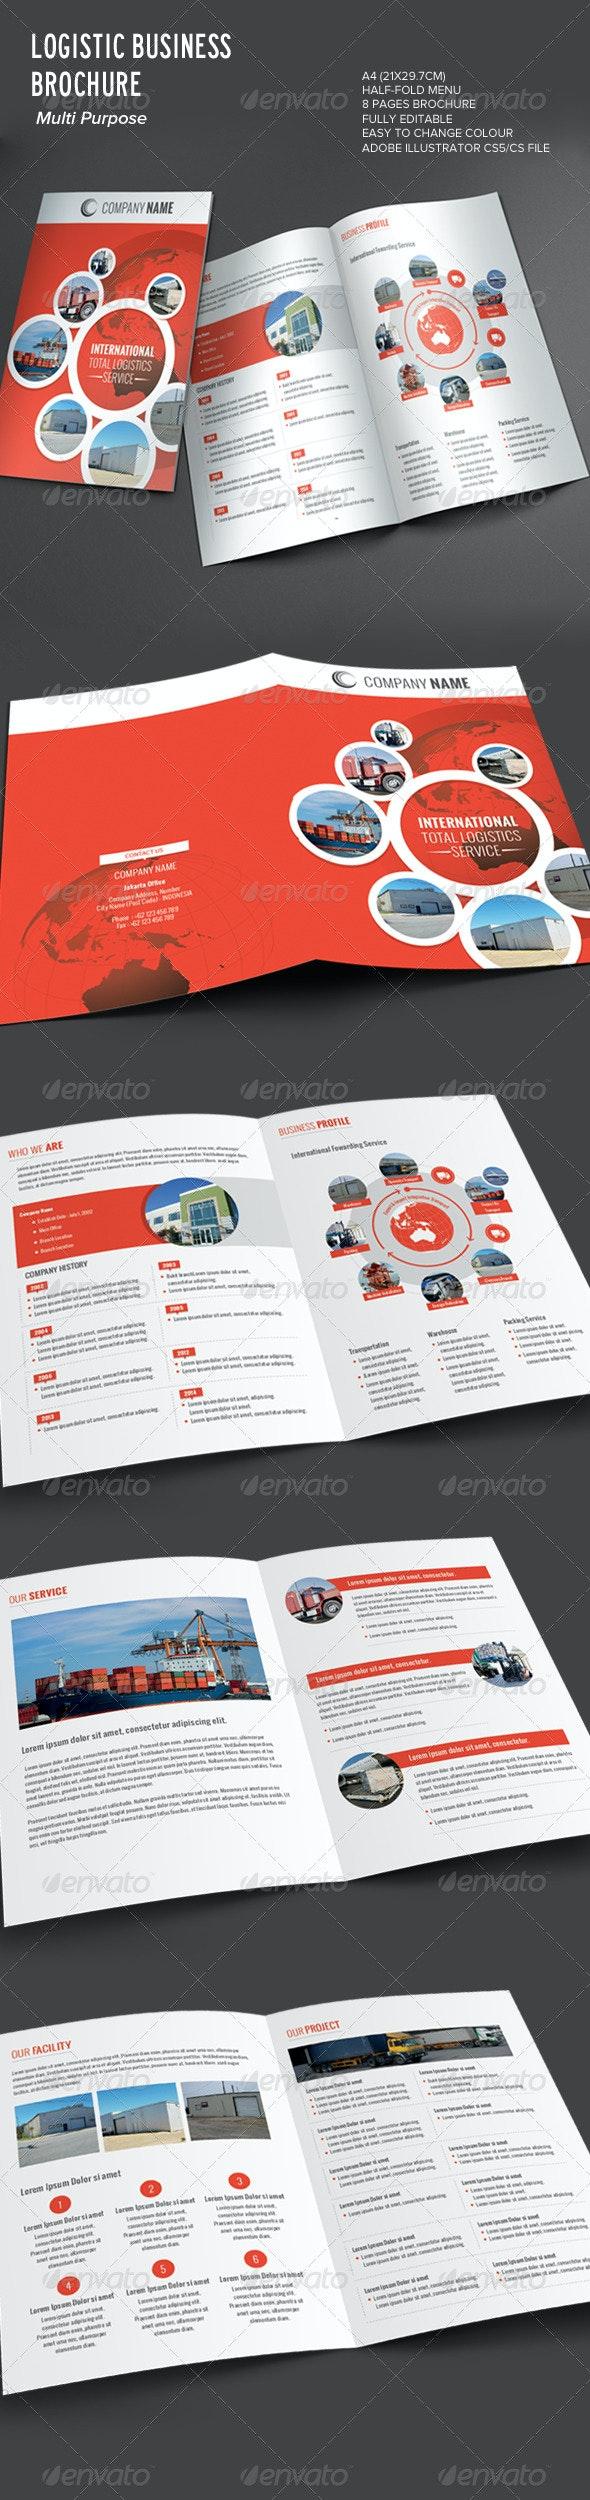 Logistic Business Brochure - Corporate Brochures